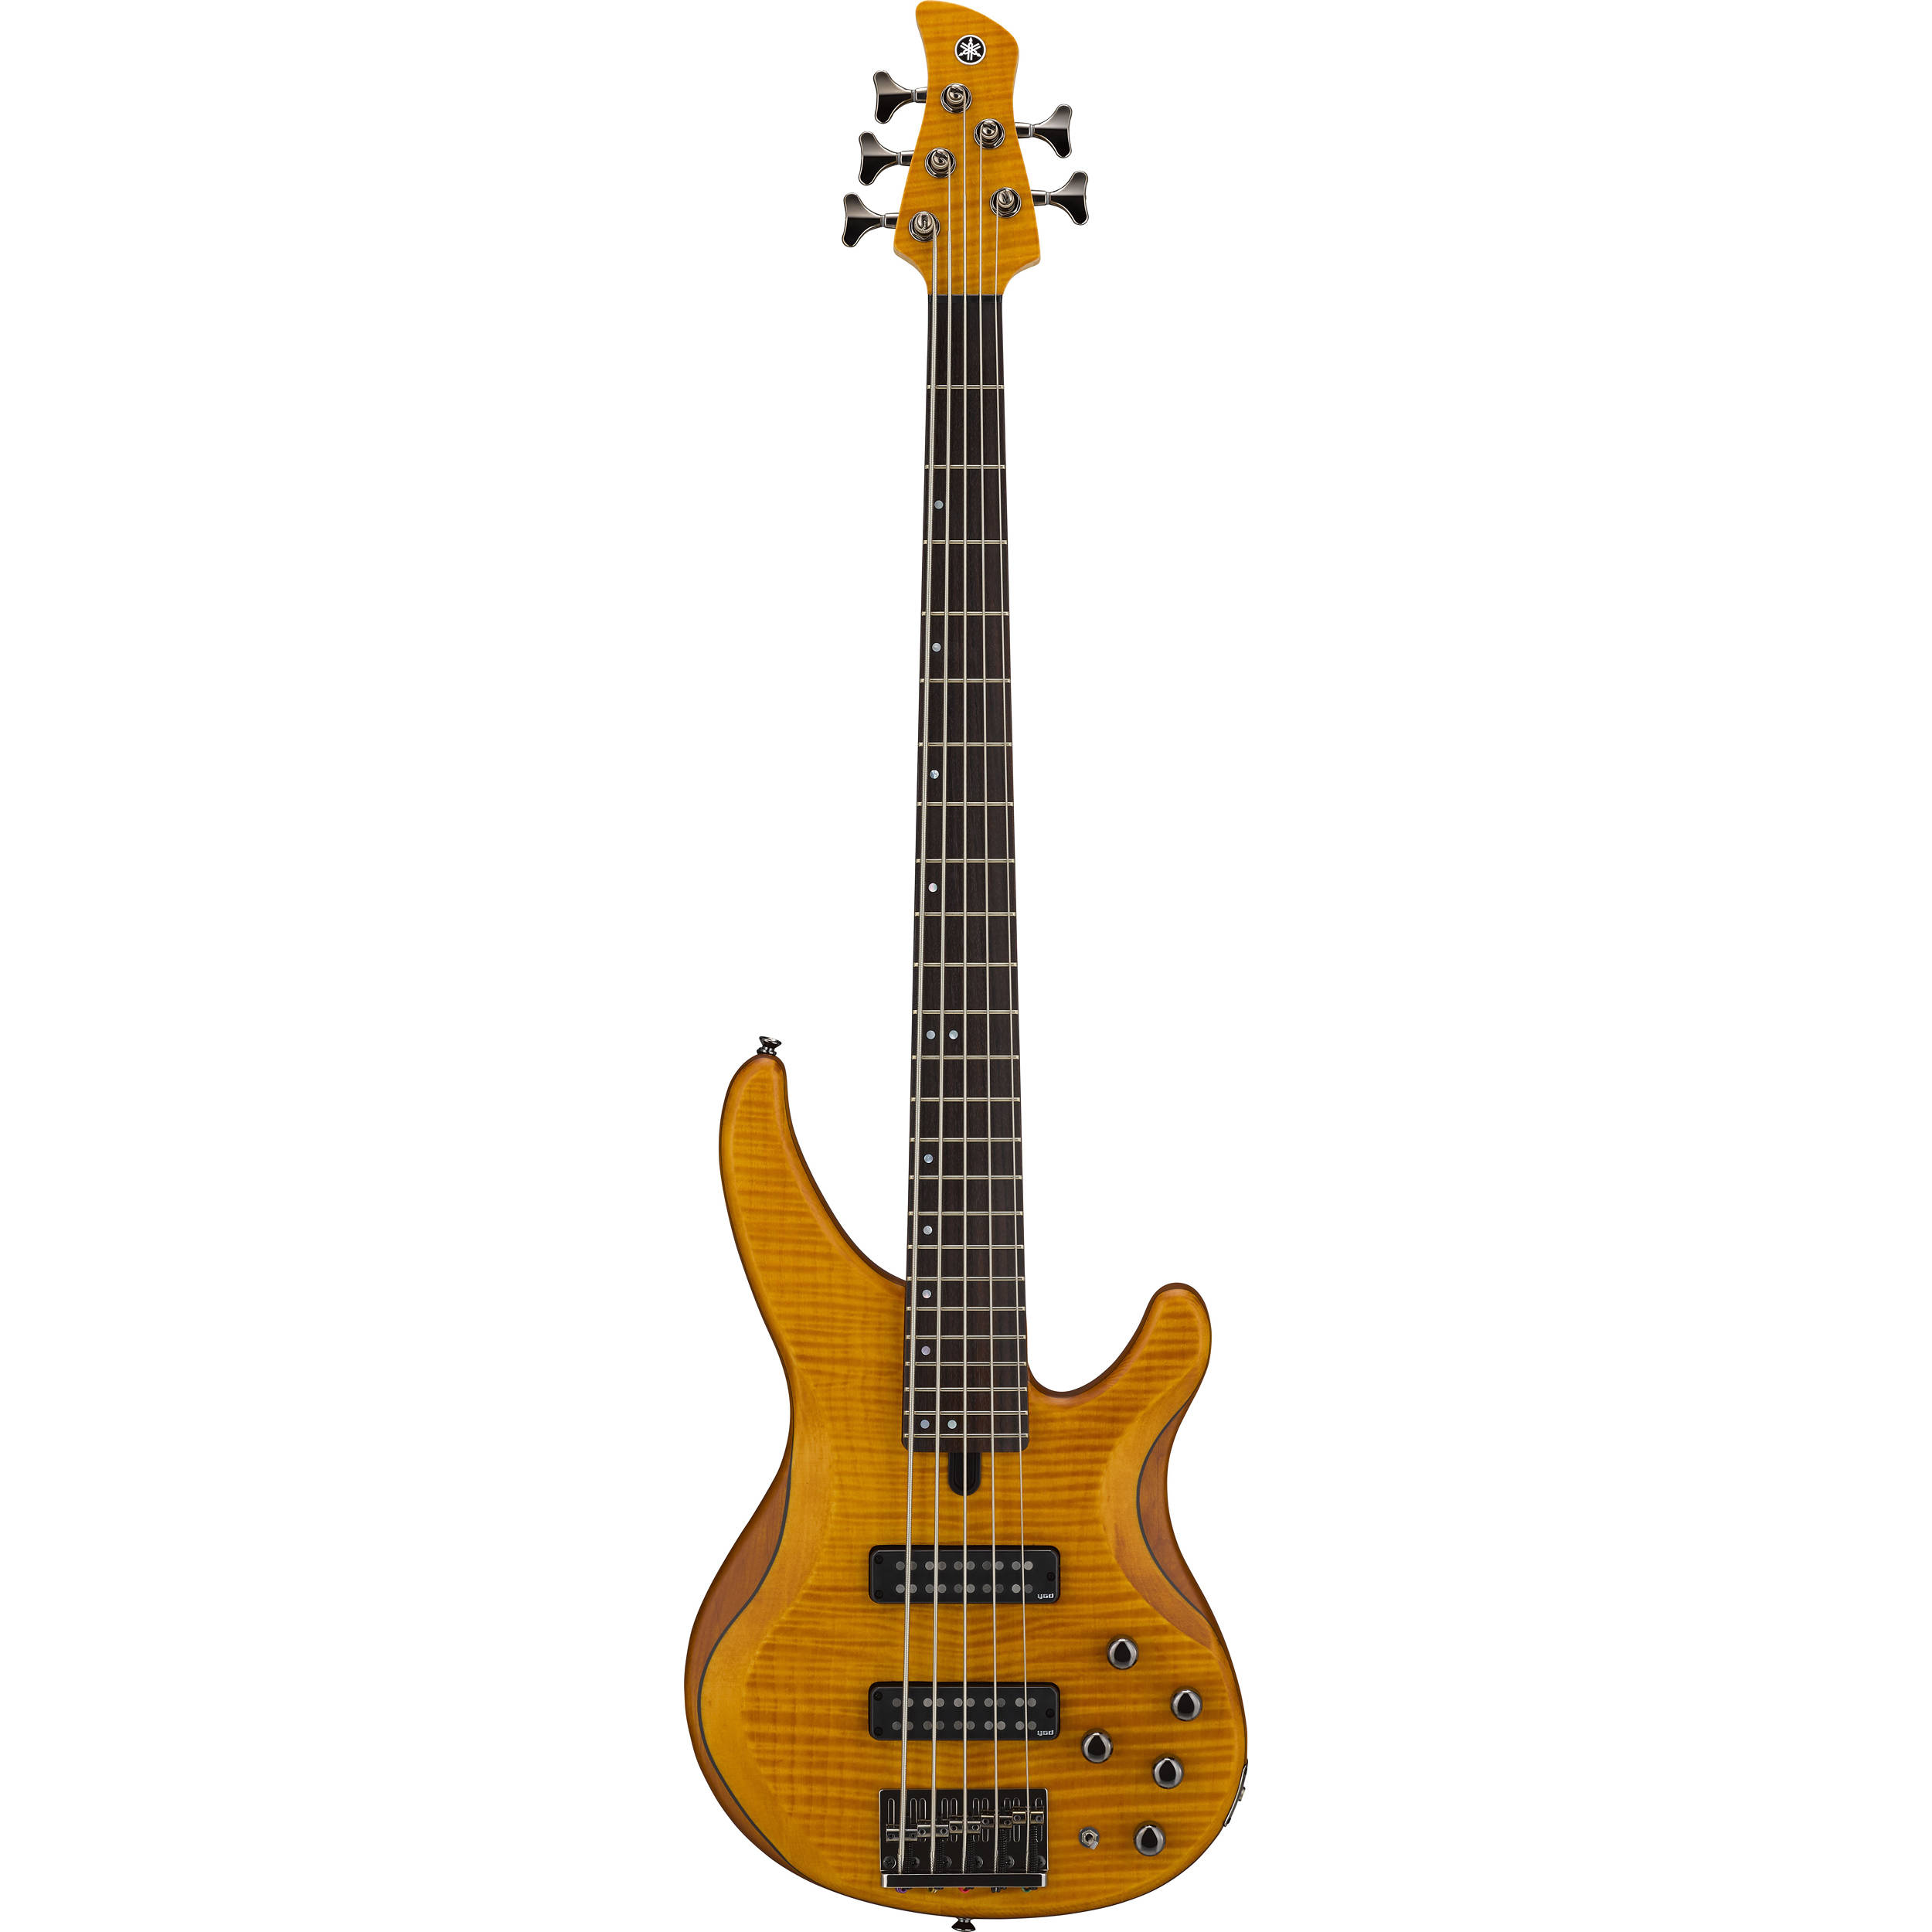 yamaha trbx605fm 5 string electric bass guitar trbx605fm ma b h